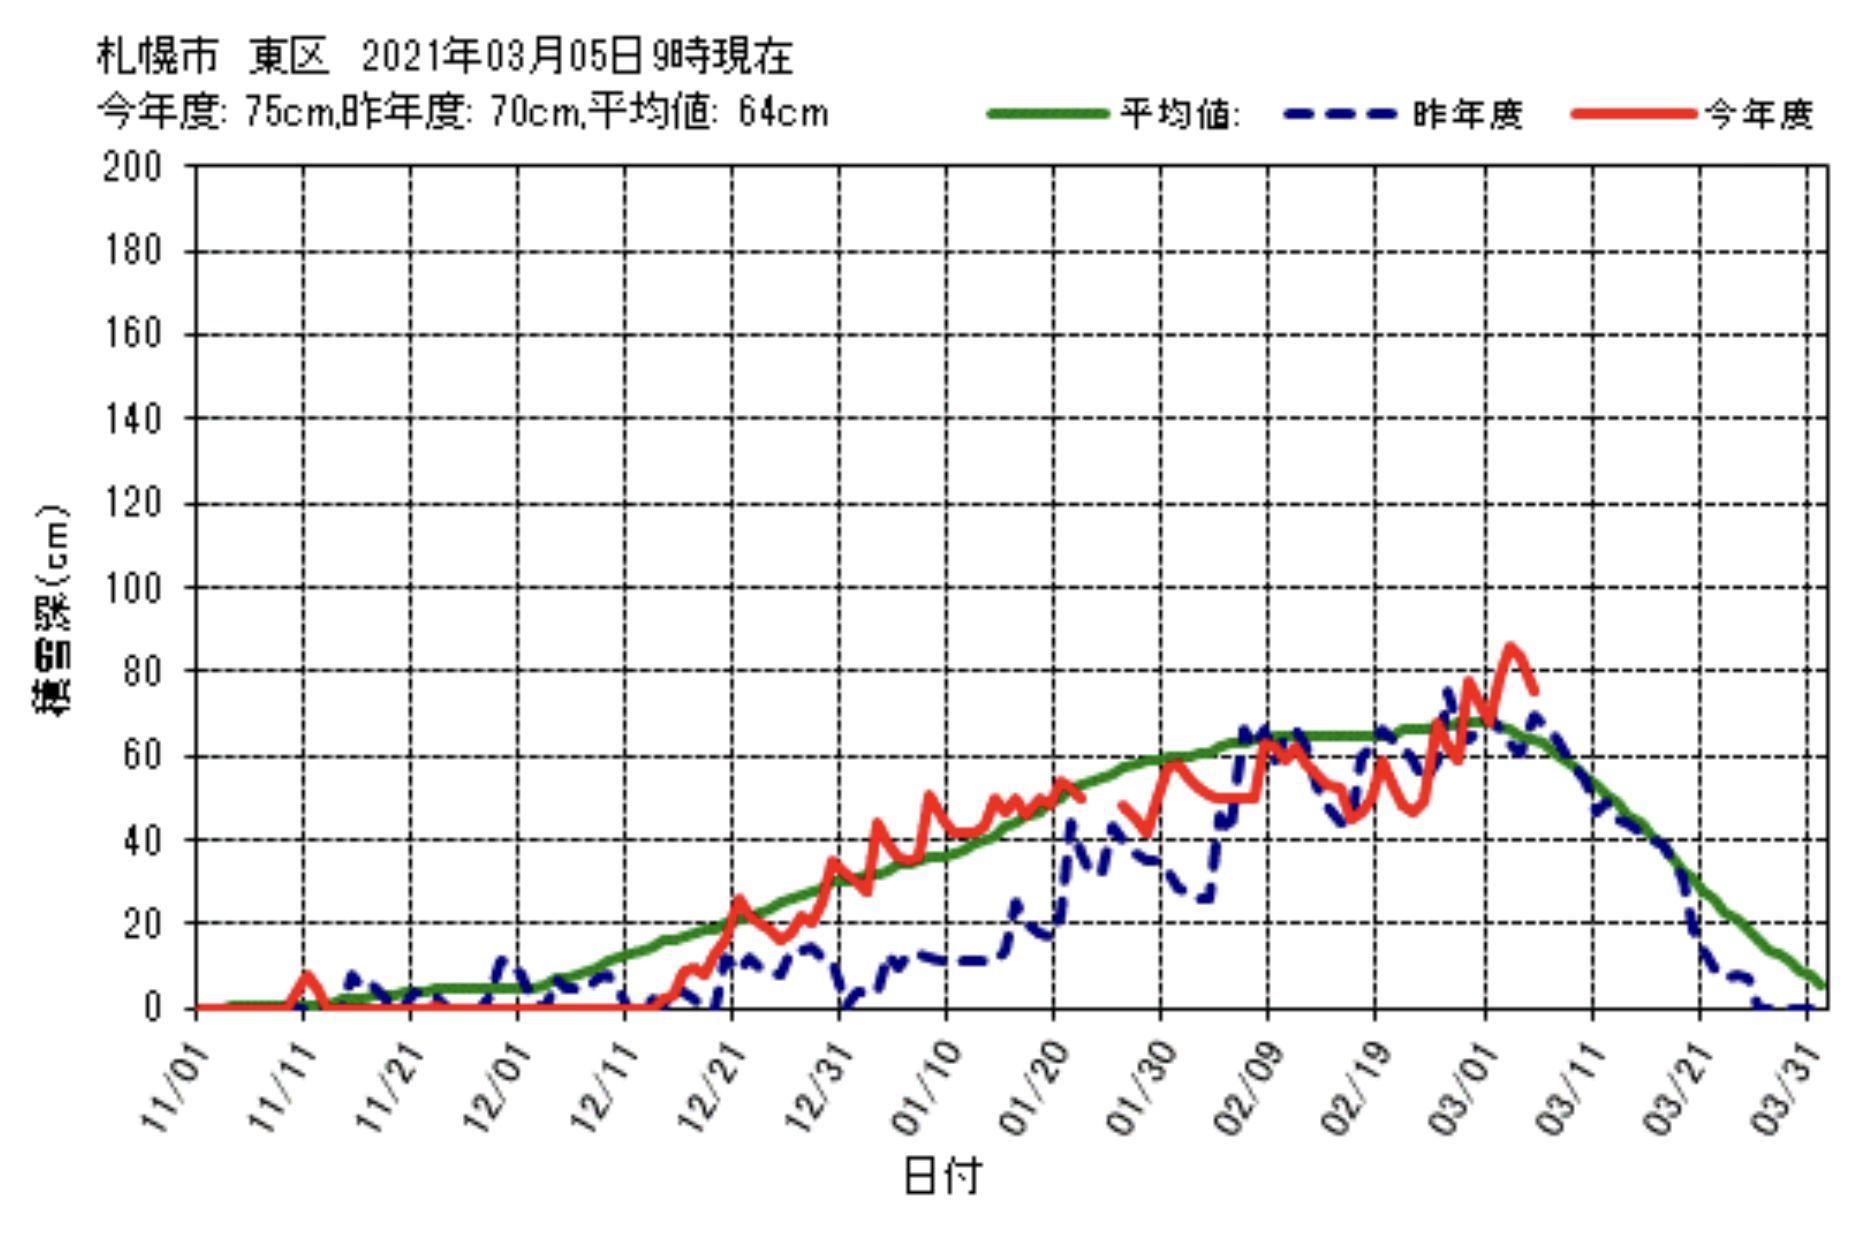 最高気温は9.8℃_c0025115_21124476.jpg